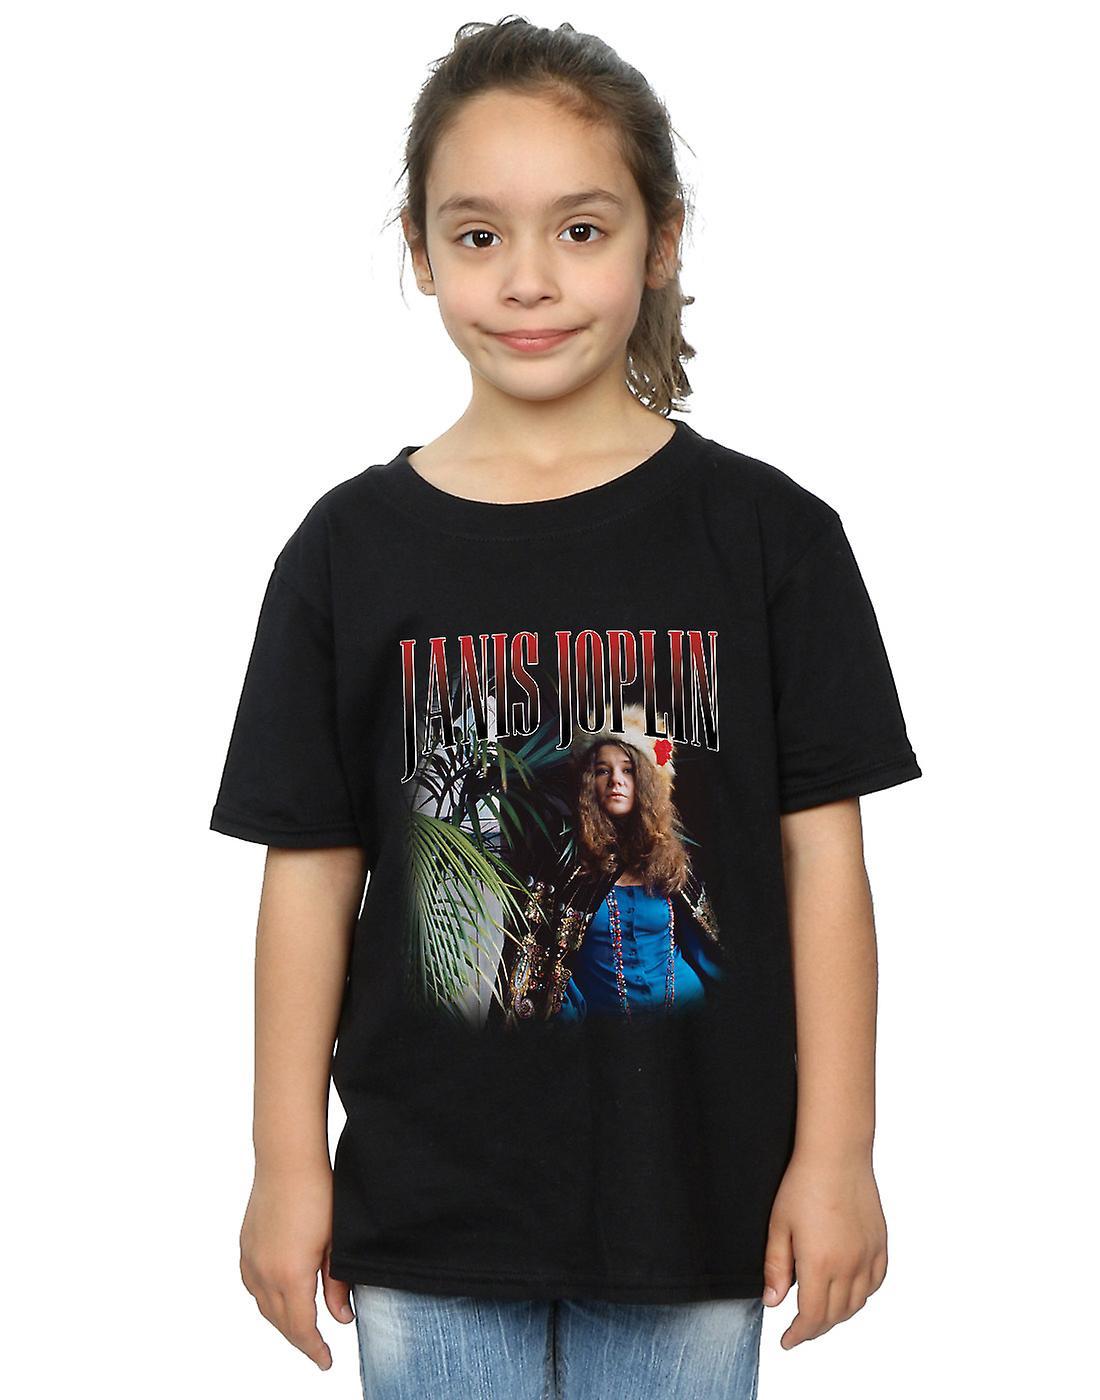 Janis Joplin Girls Baron Homage T-Shirt